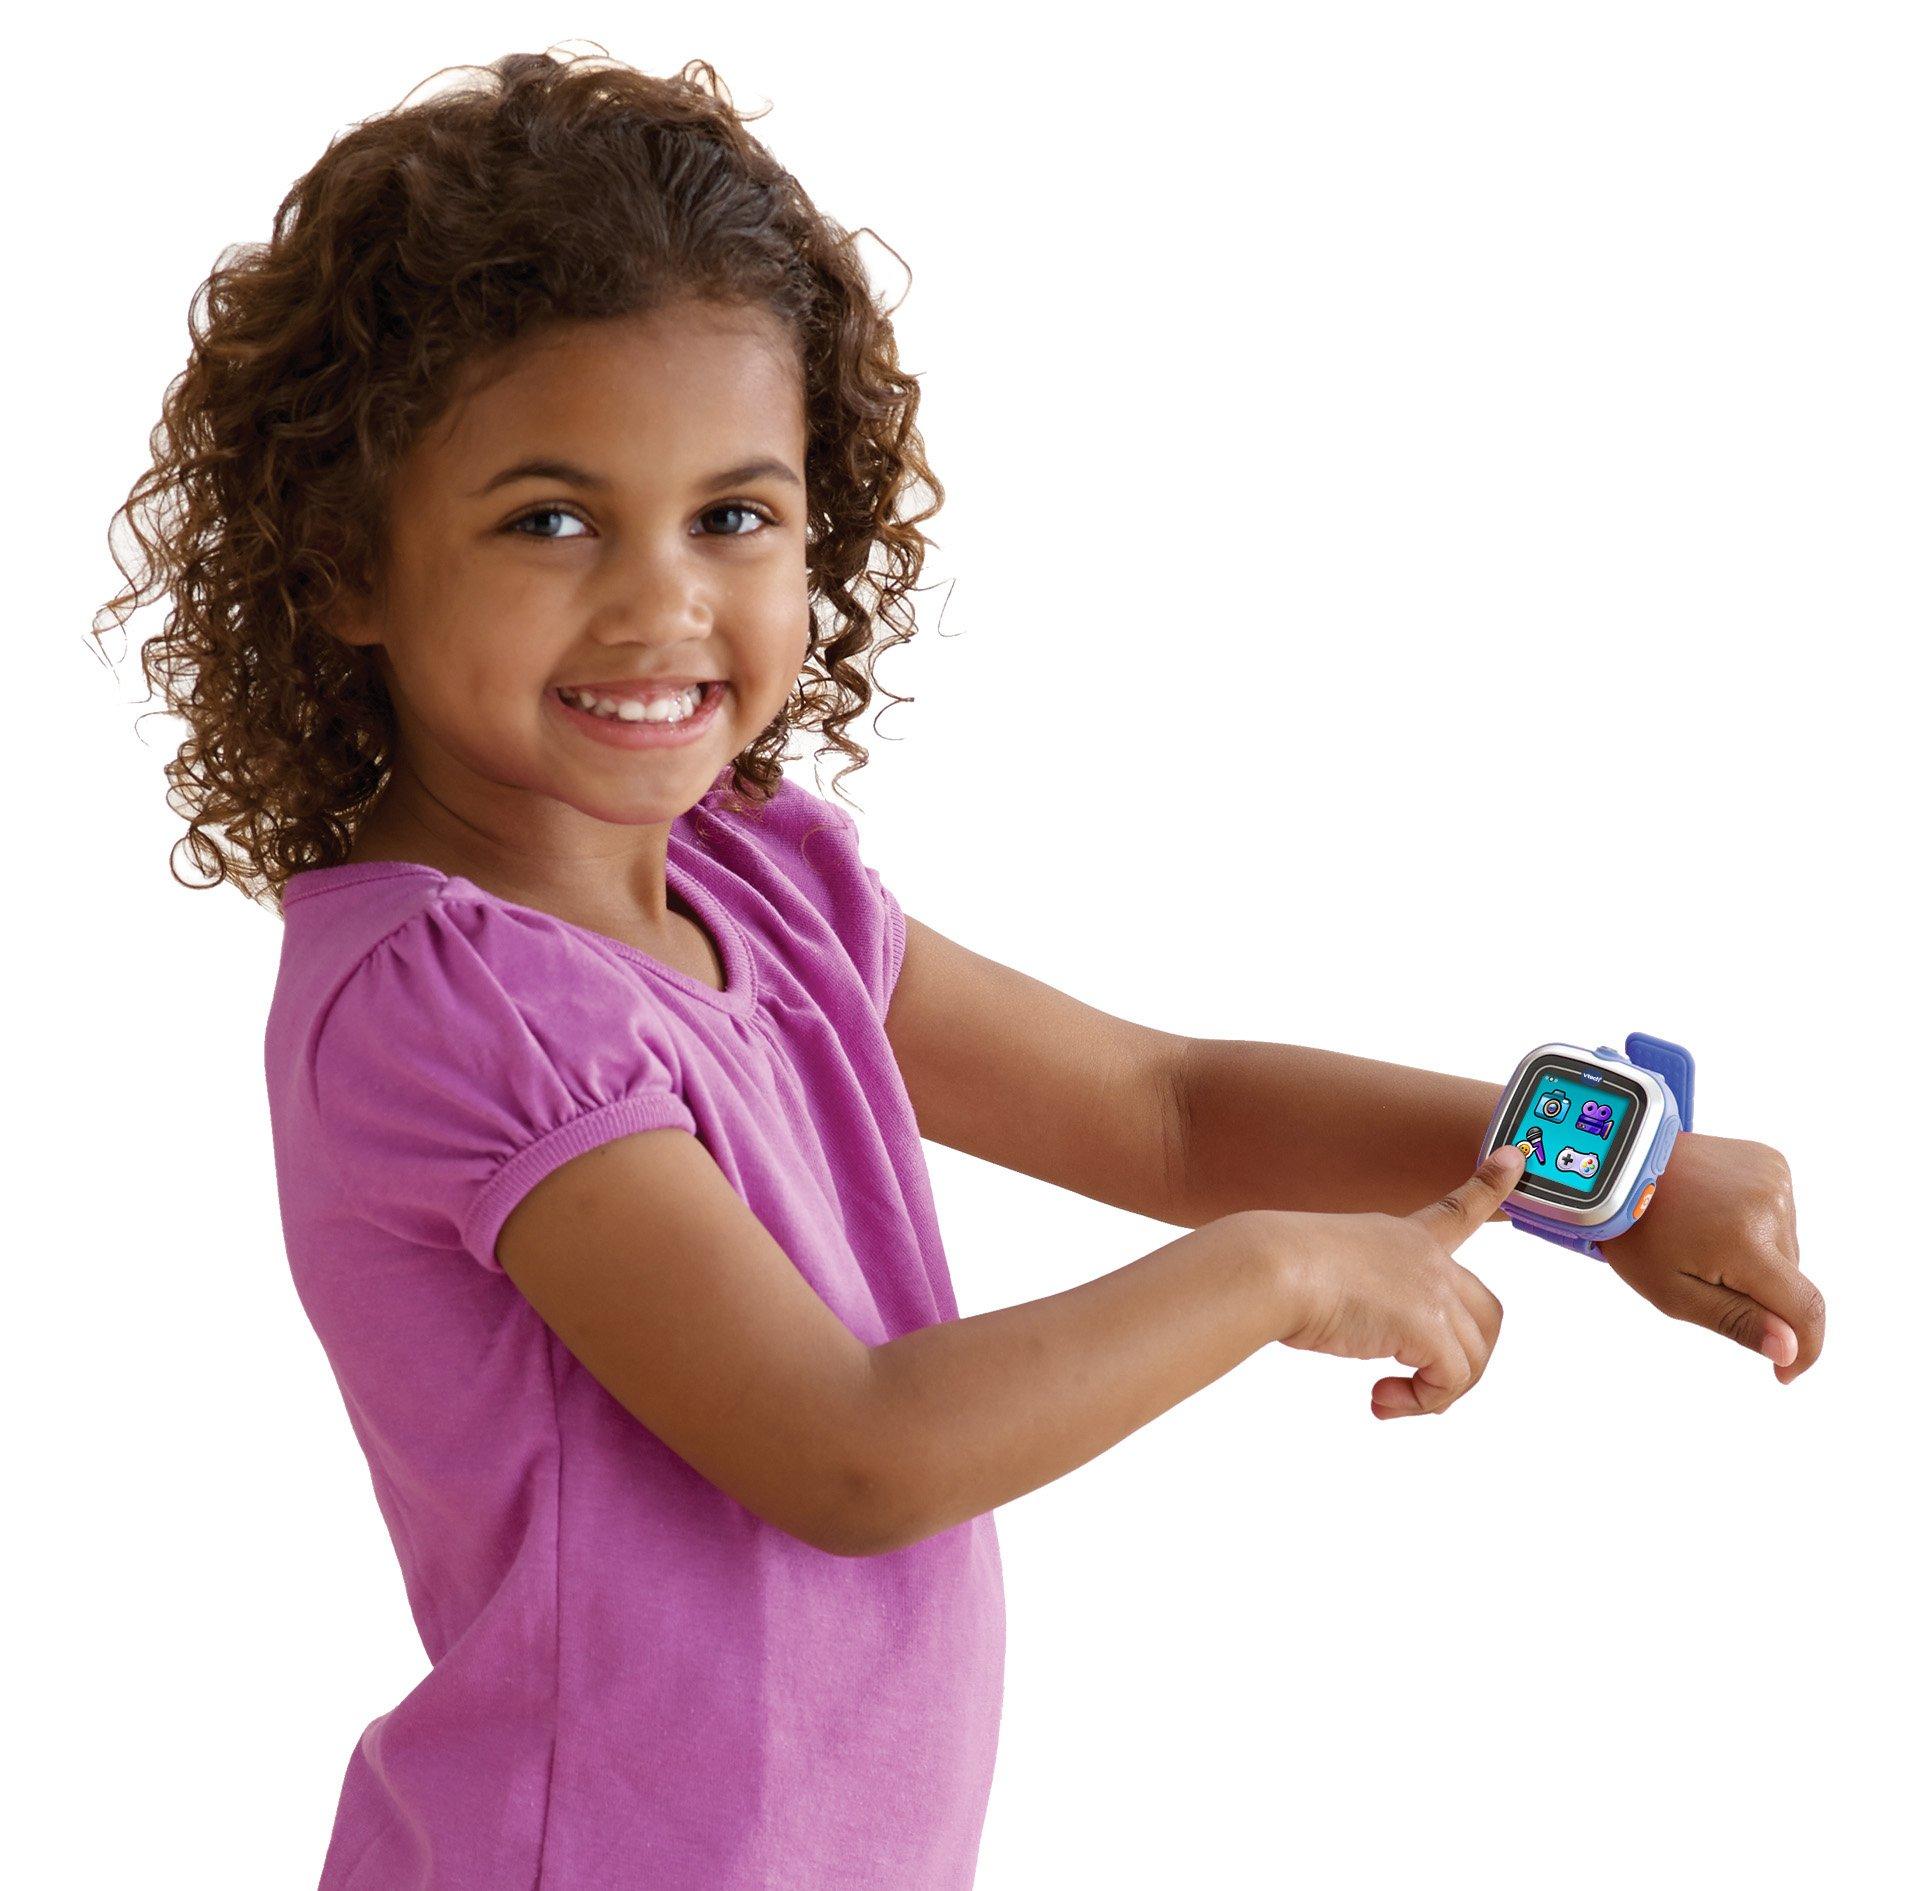 VTech Kidizoom Smartwatch, Blue (Discontinued by manufacturer) by VTech Kidizoom (Image #5)